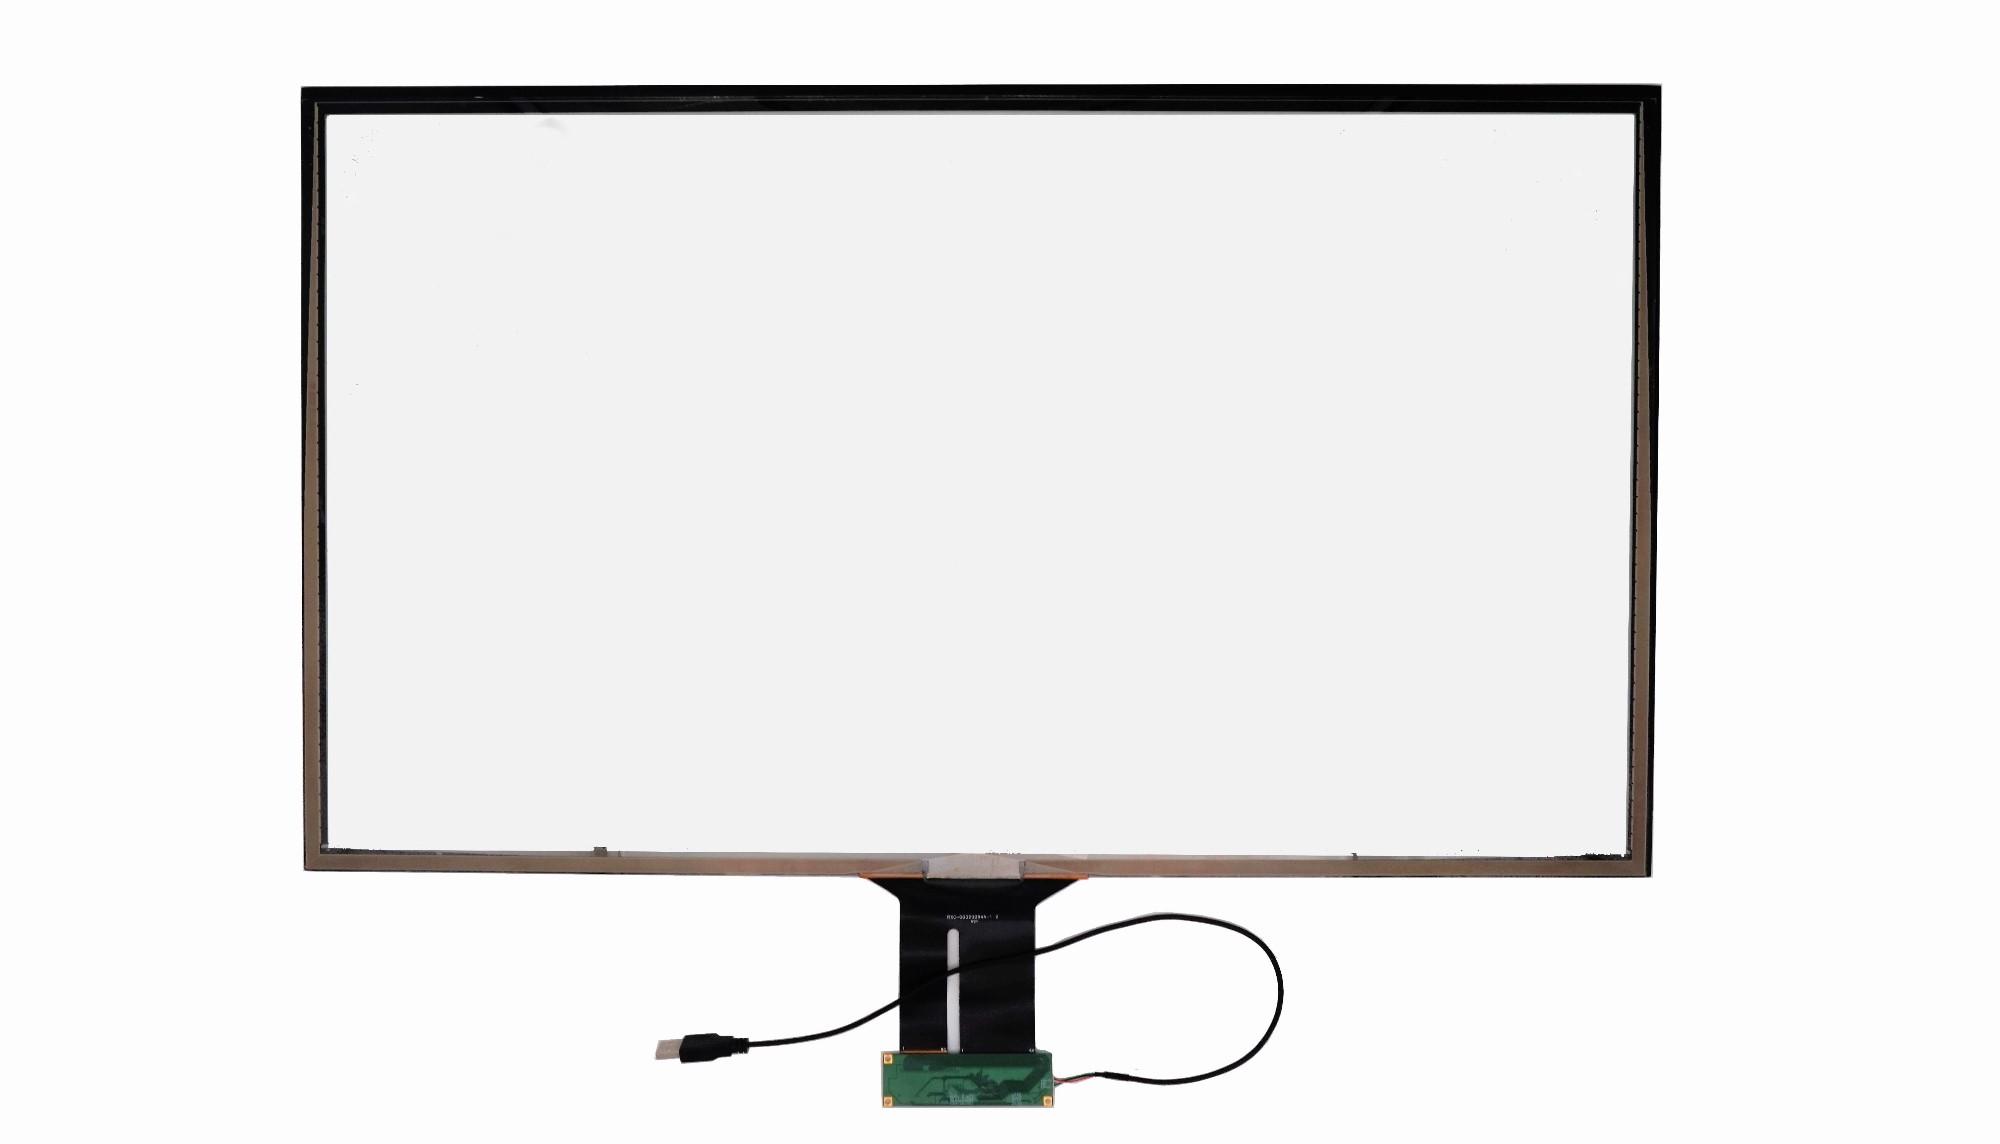 Custom China Hmi 32 Inch Touch Panel Usb Interface Muilt Points Touch, Hmi 32 Inch Touch Panel Usb Interface Muilt Points Touch Factory, Hmi 32 Inch Touch Panel Usb Interface Muilt Points Touch OEM